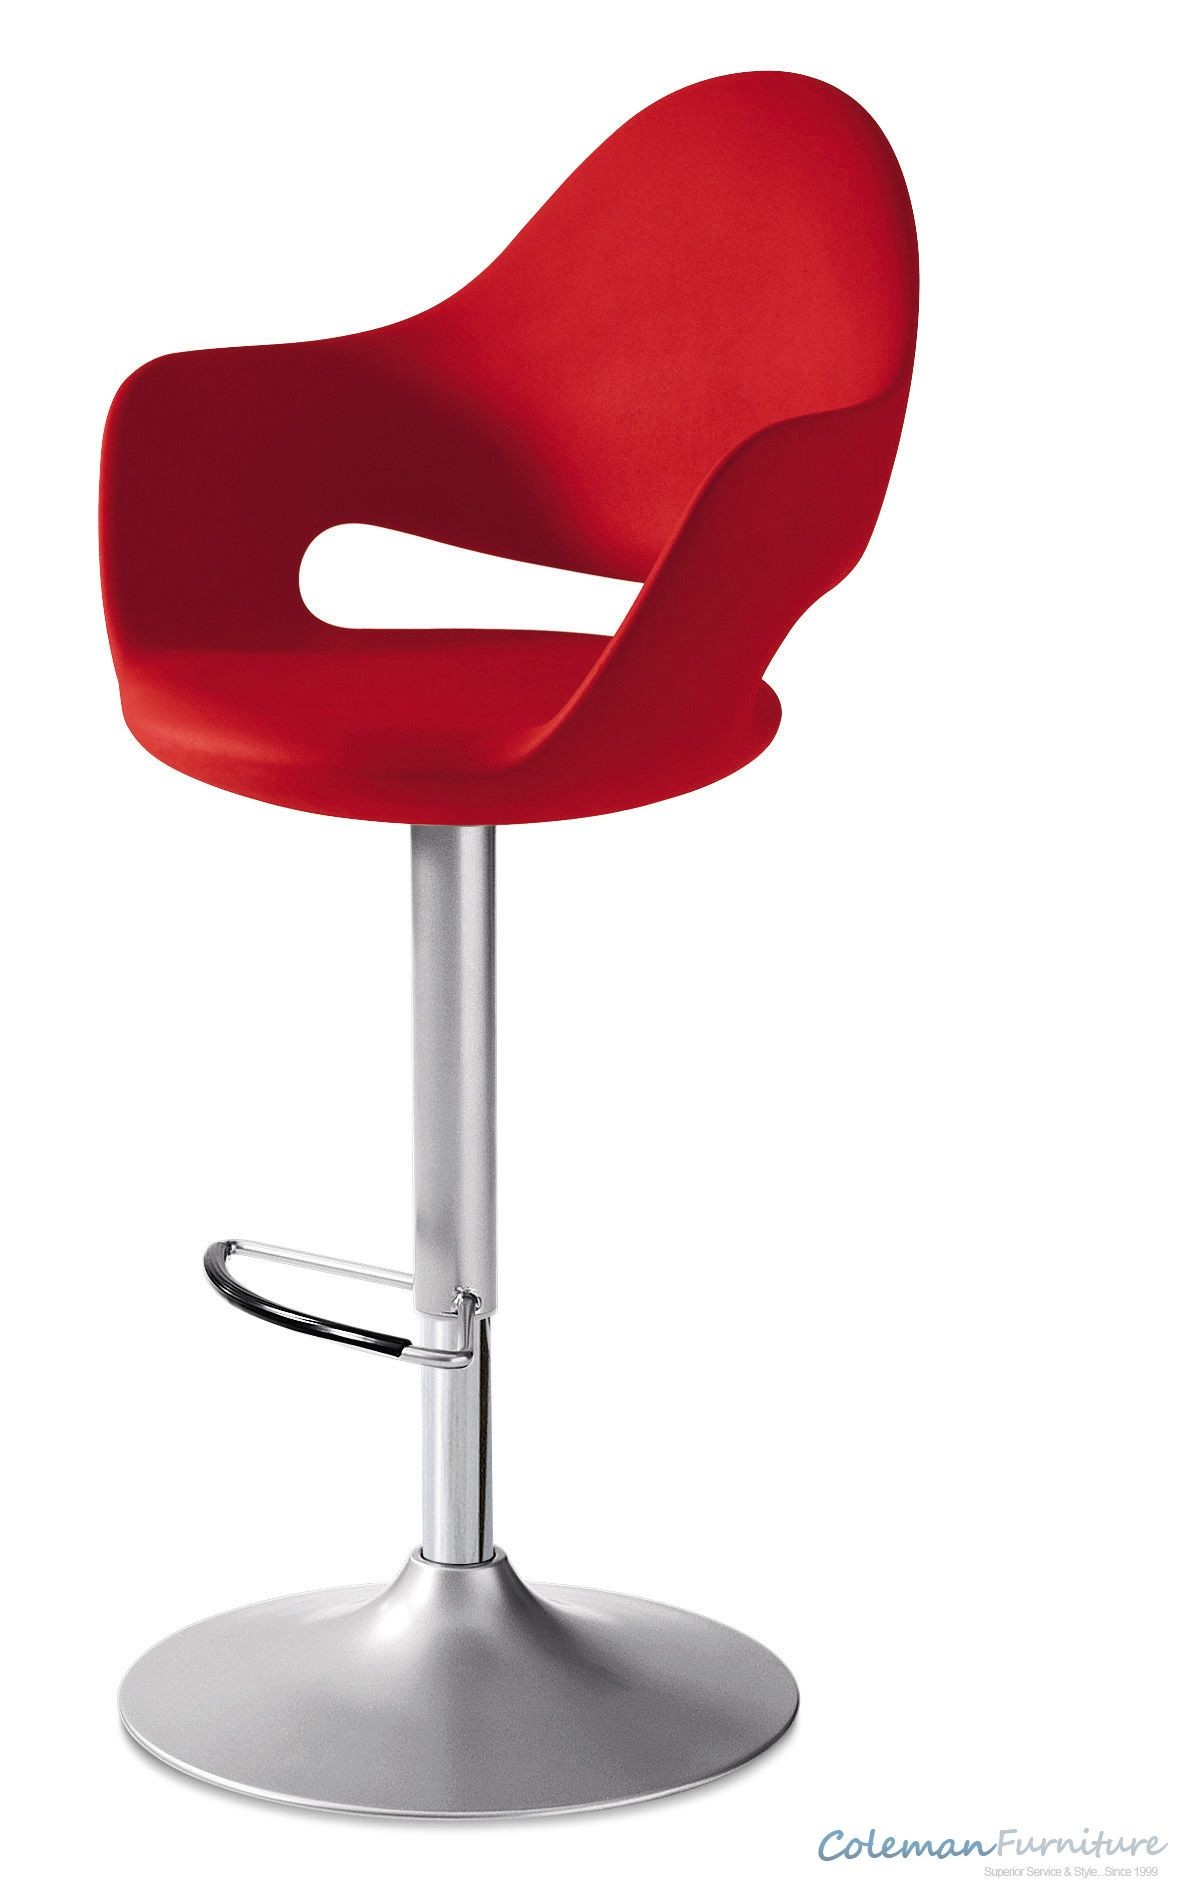 Soft Red Swivel Stool From Domitalia Soft As Ro Z15